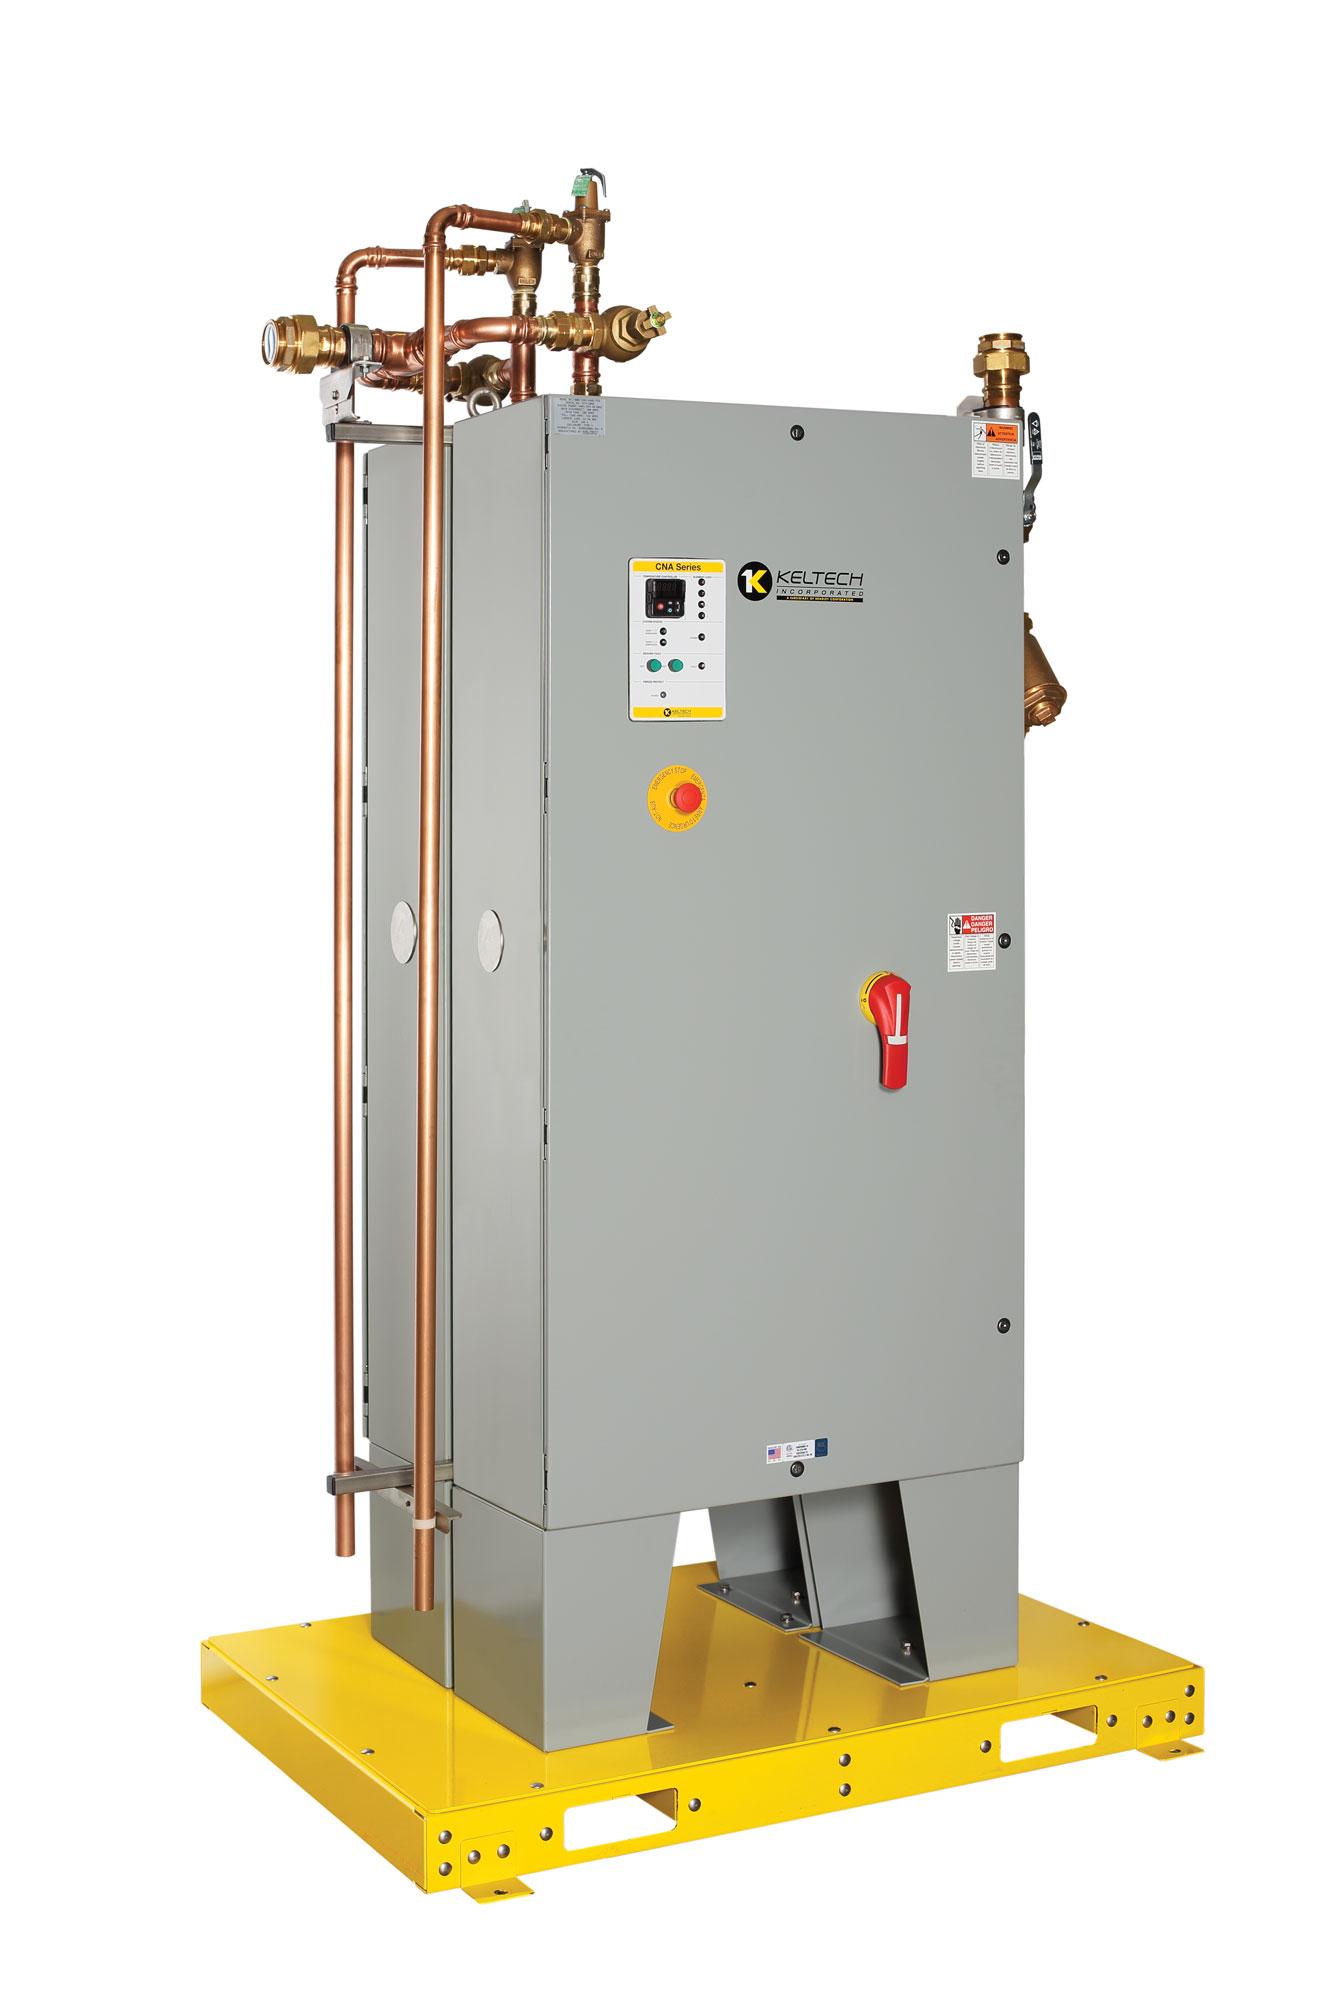 Keltech Industrial Water Heating Skid Bradley Corporation